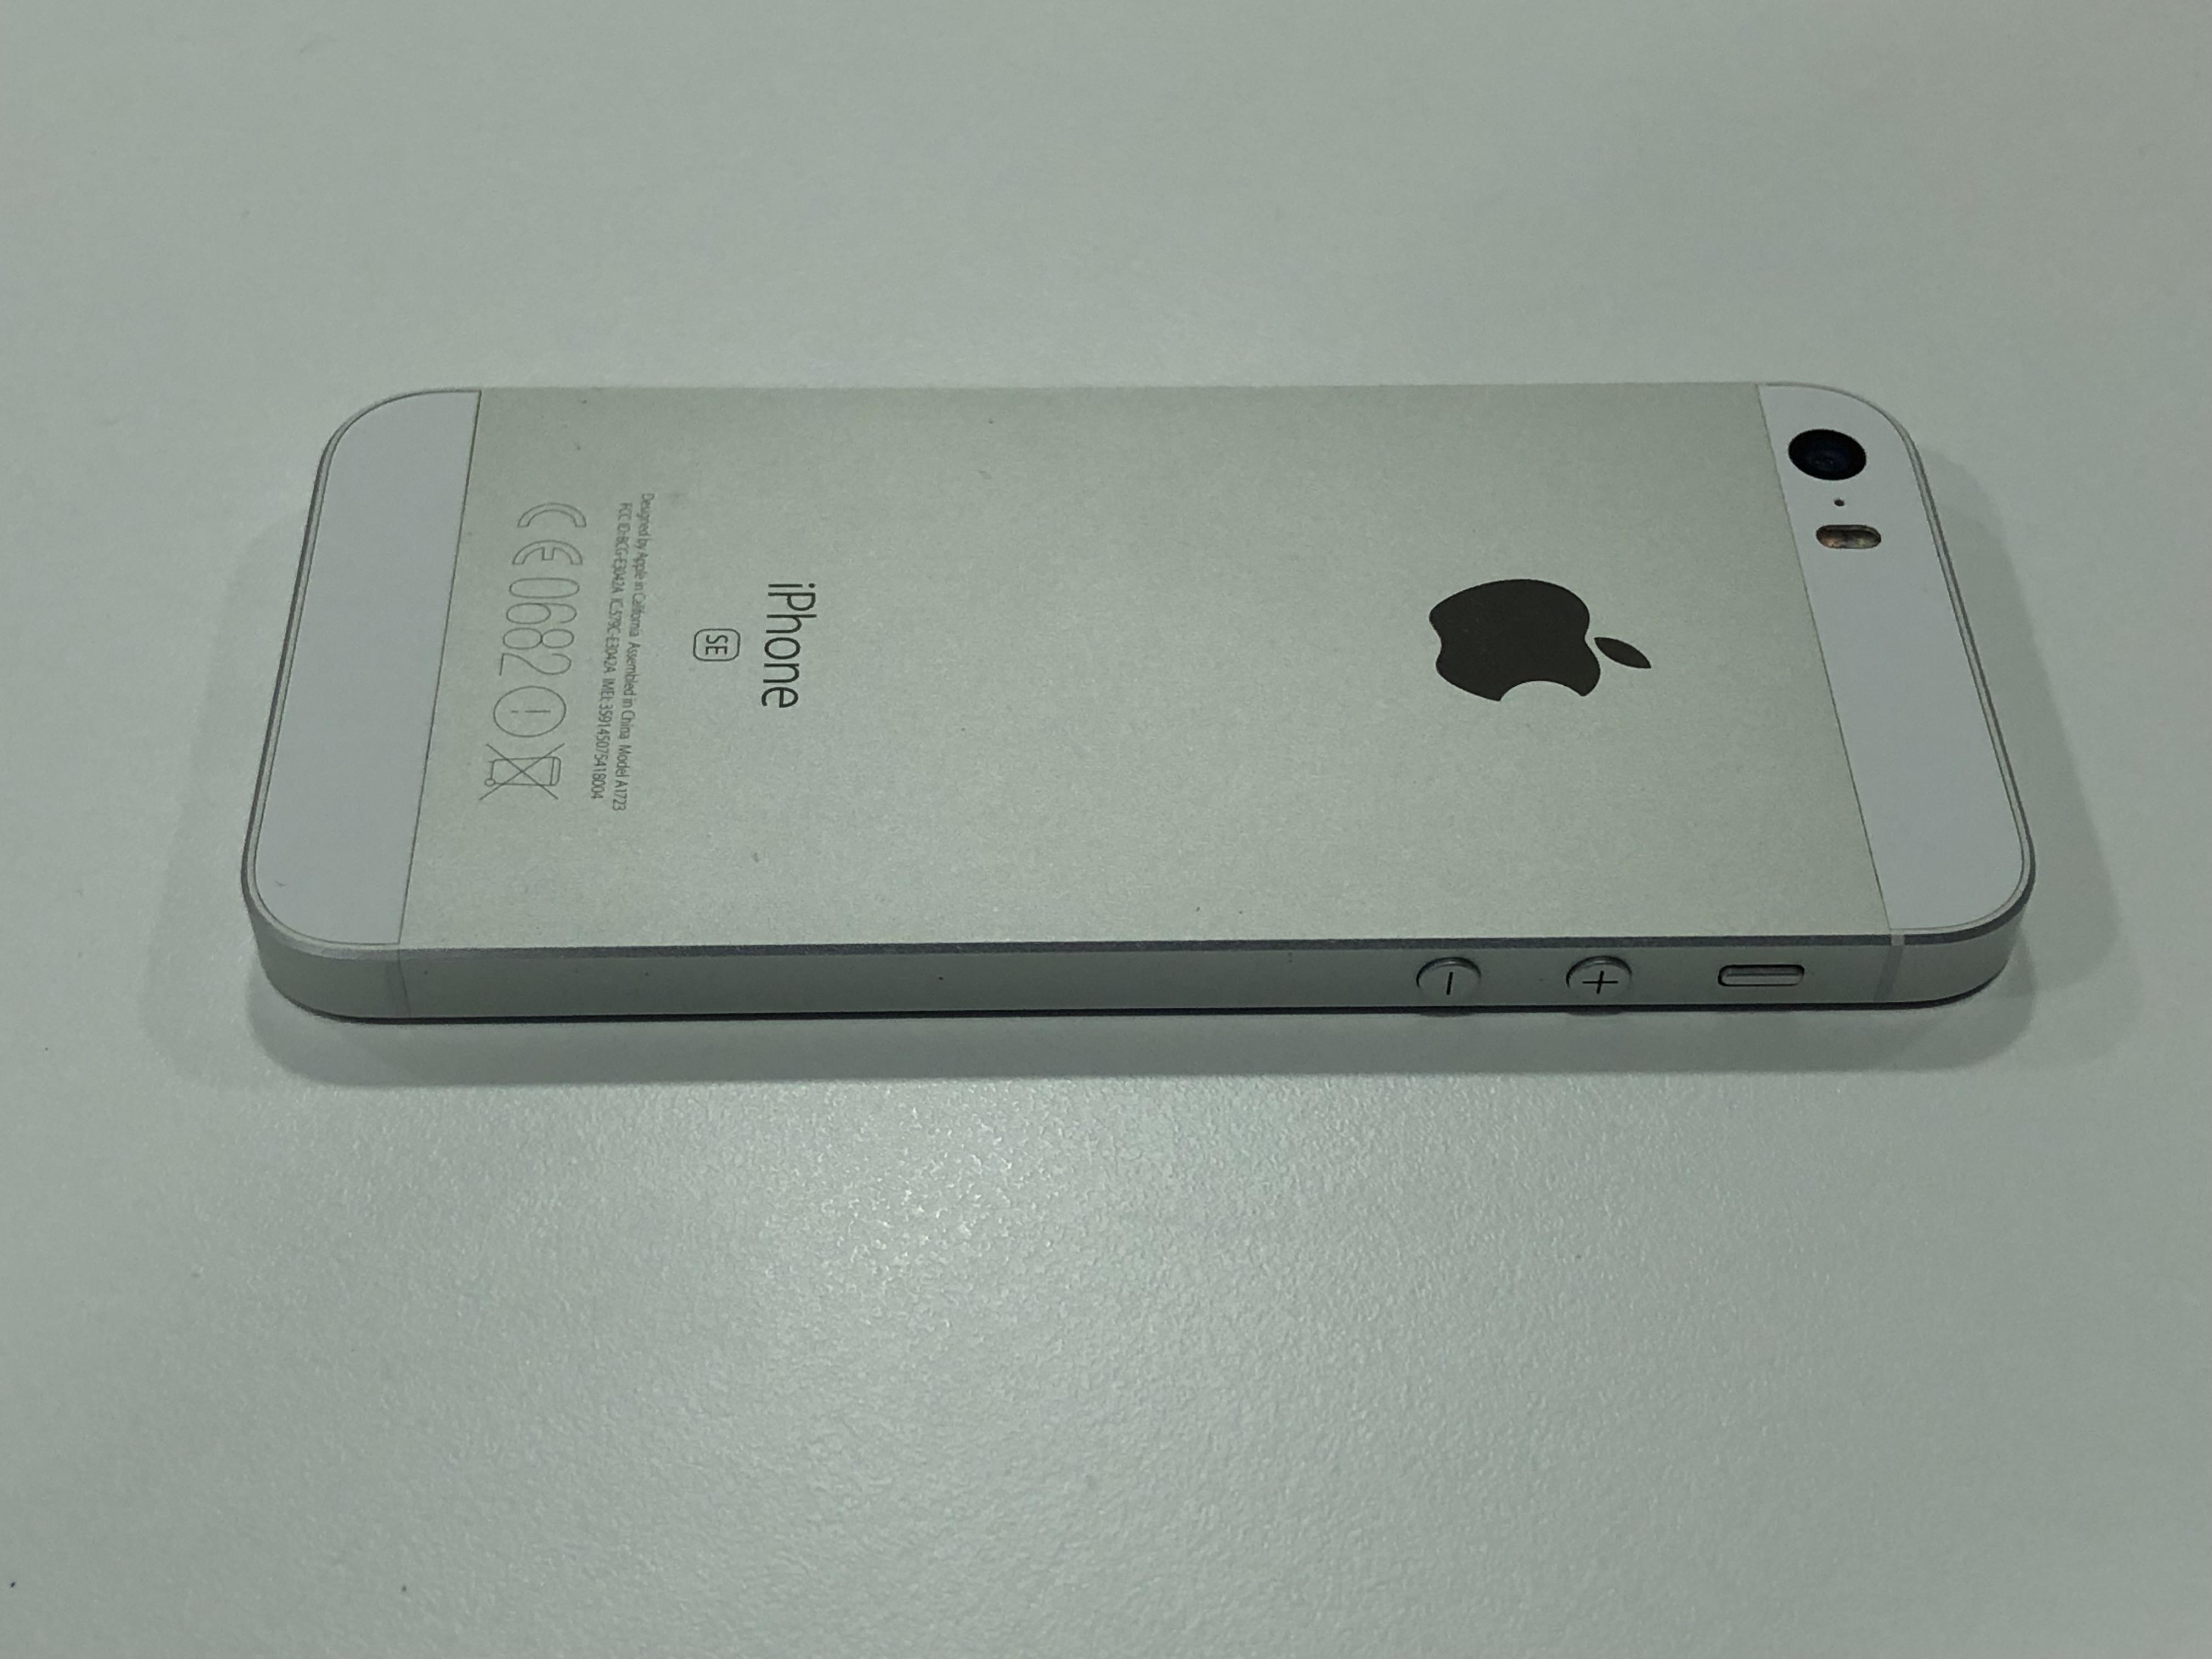 iPhone SE 16GB, 16 GB, SILVER, imagen 2